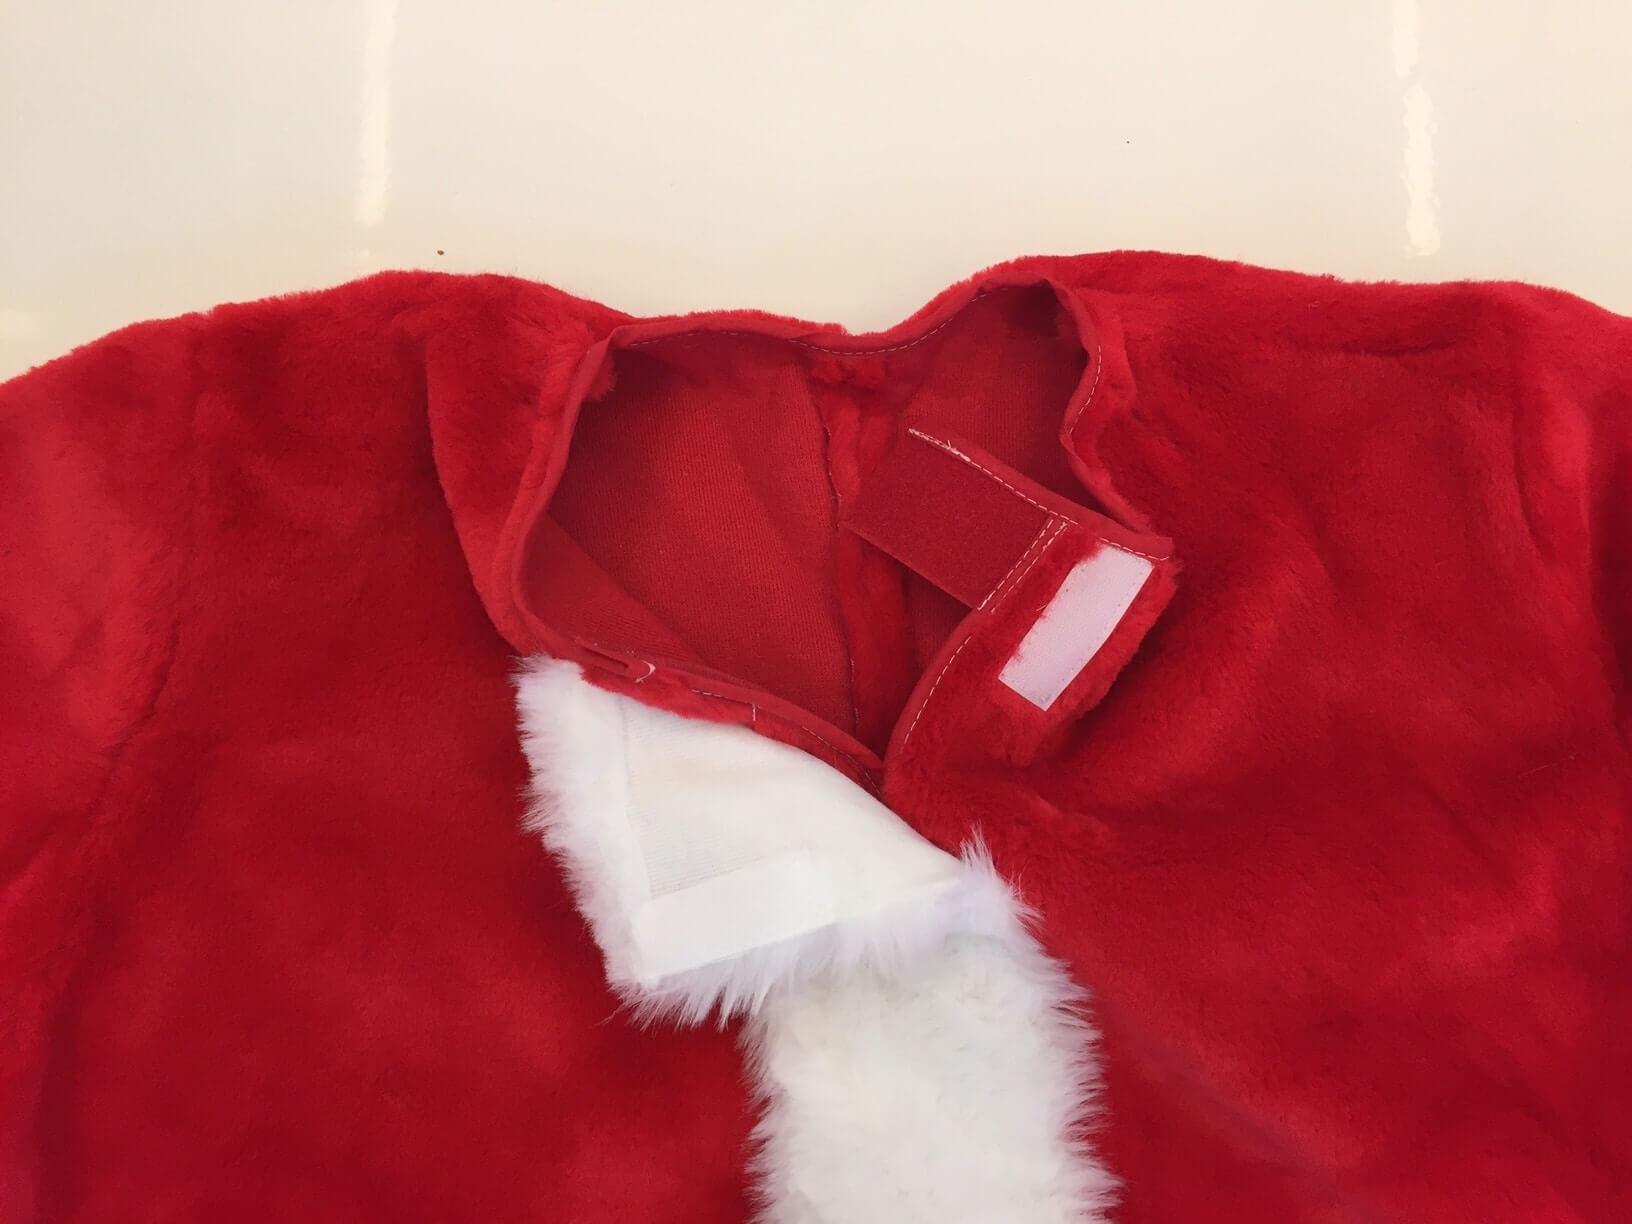 Profi-Weihnachtsmann-Nikolaus-Kostuem-198j